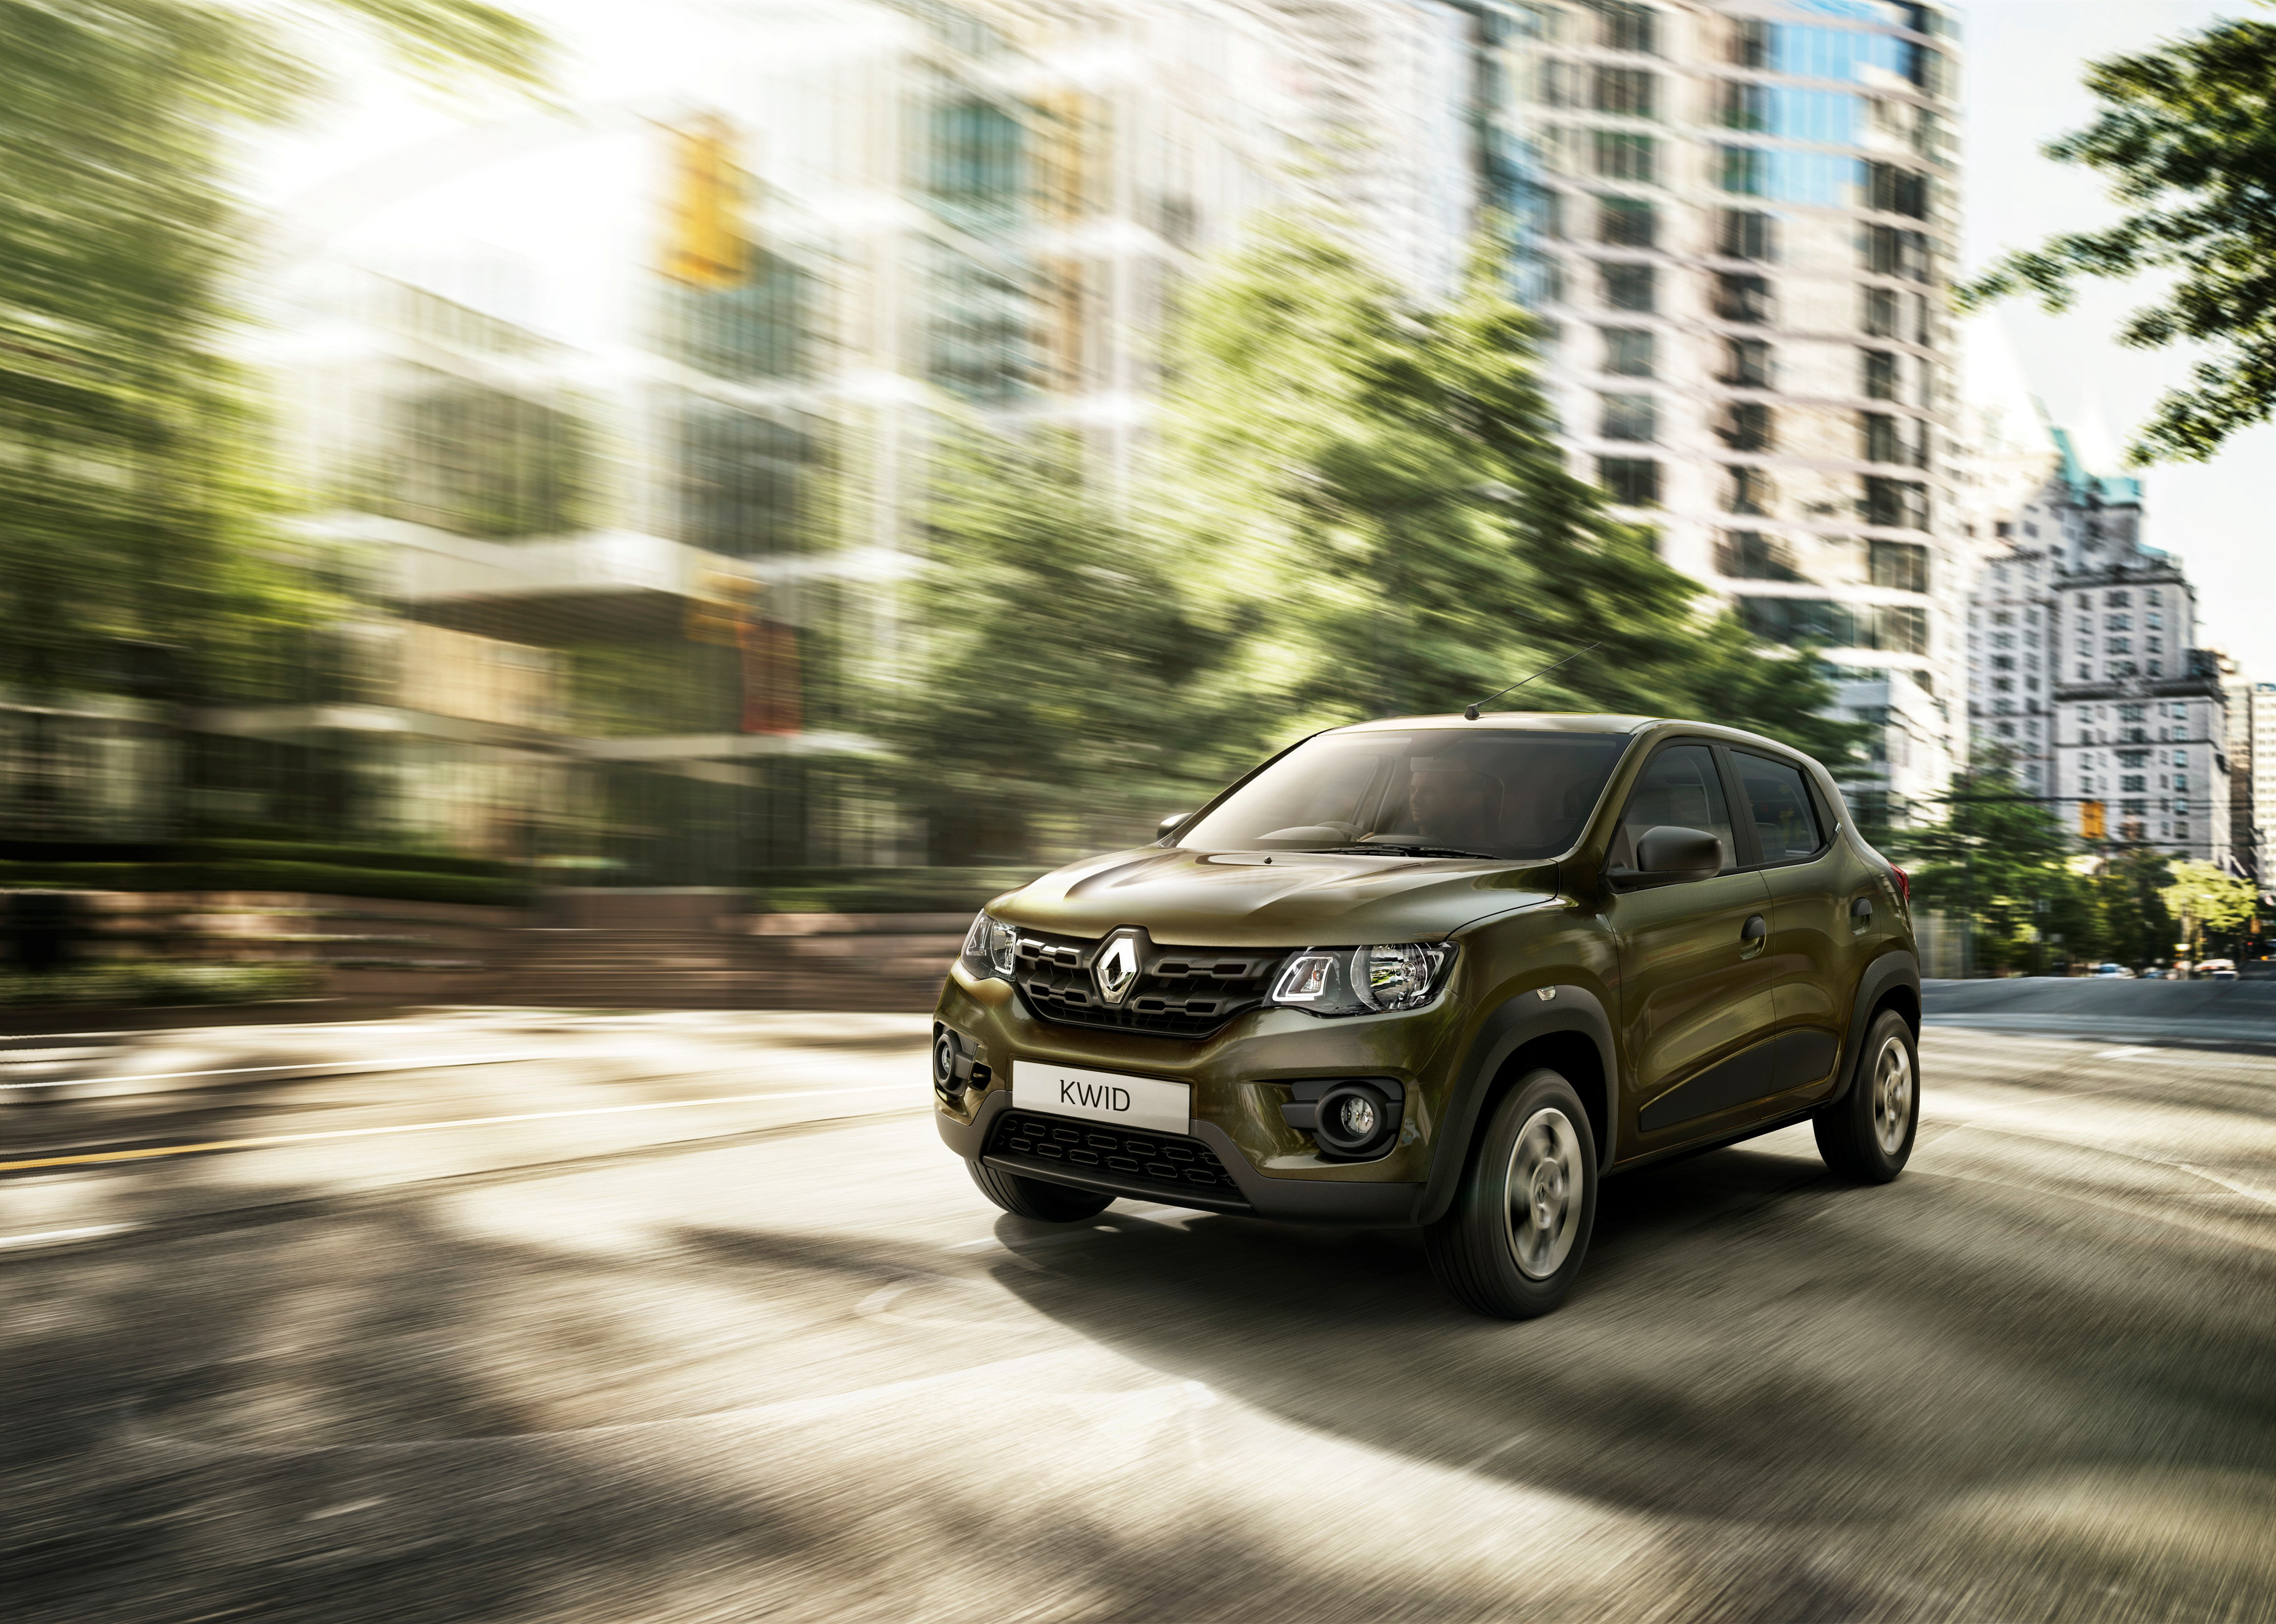 Renault Kwid 2015 - avant / front